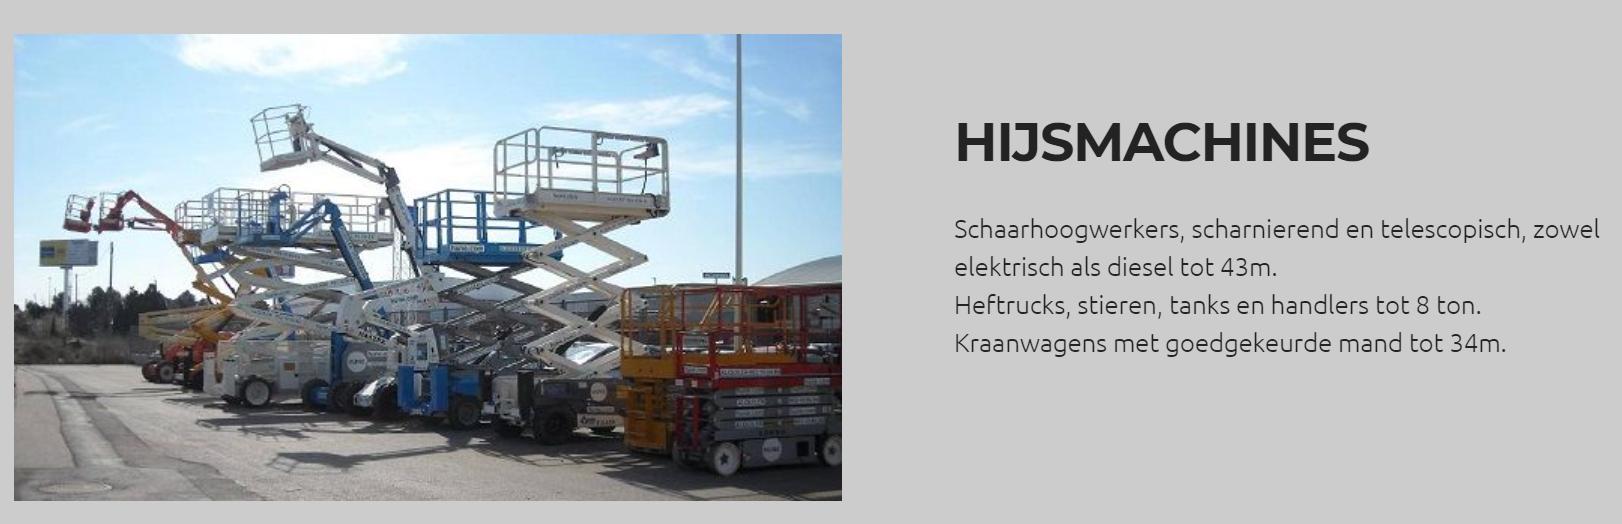 Hijsmachines--1